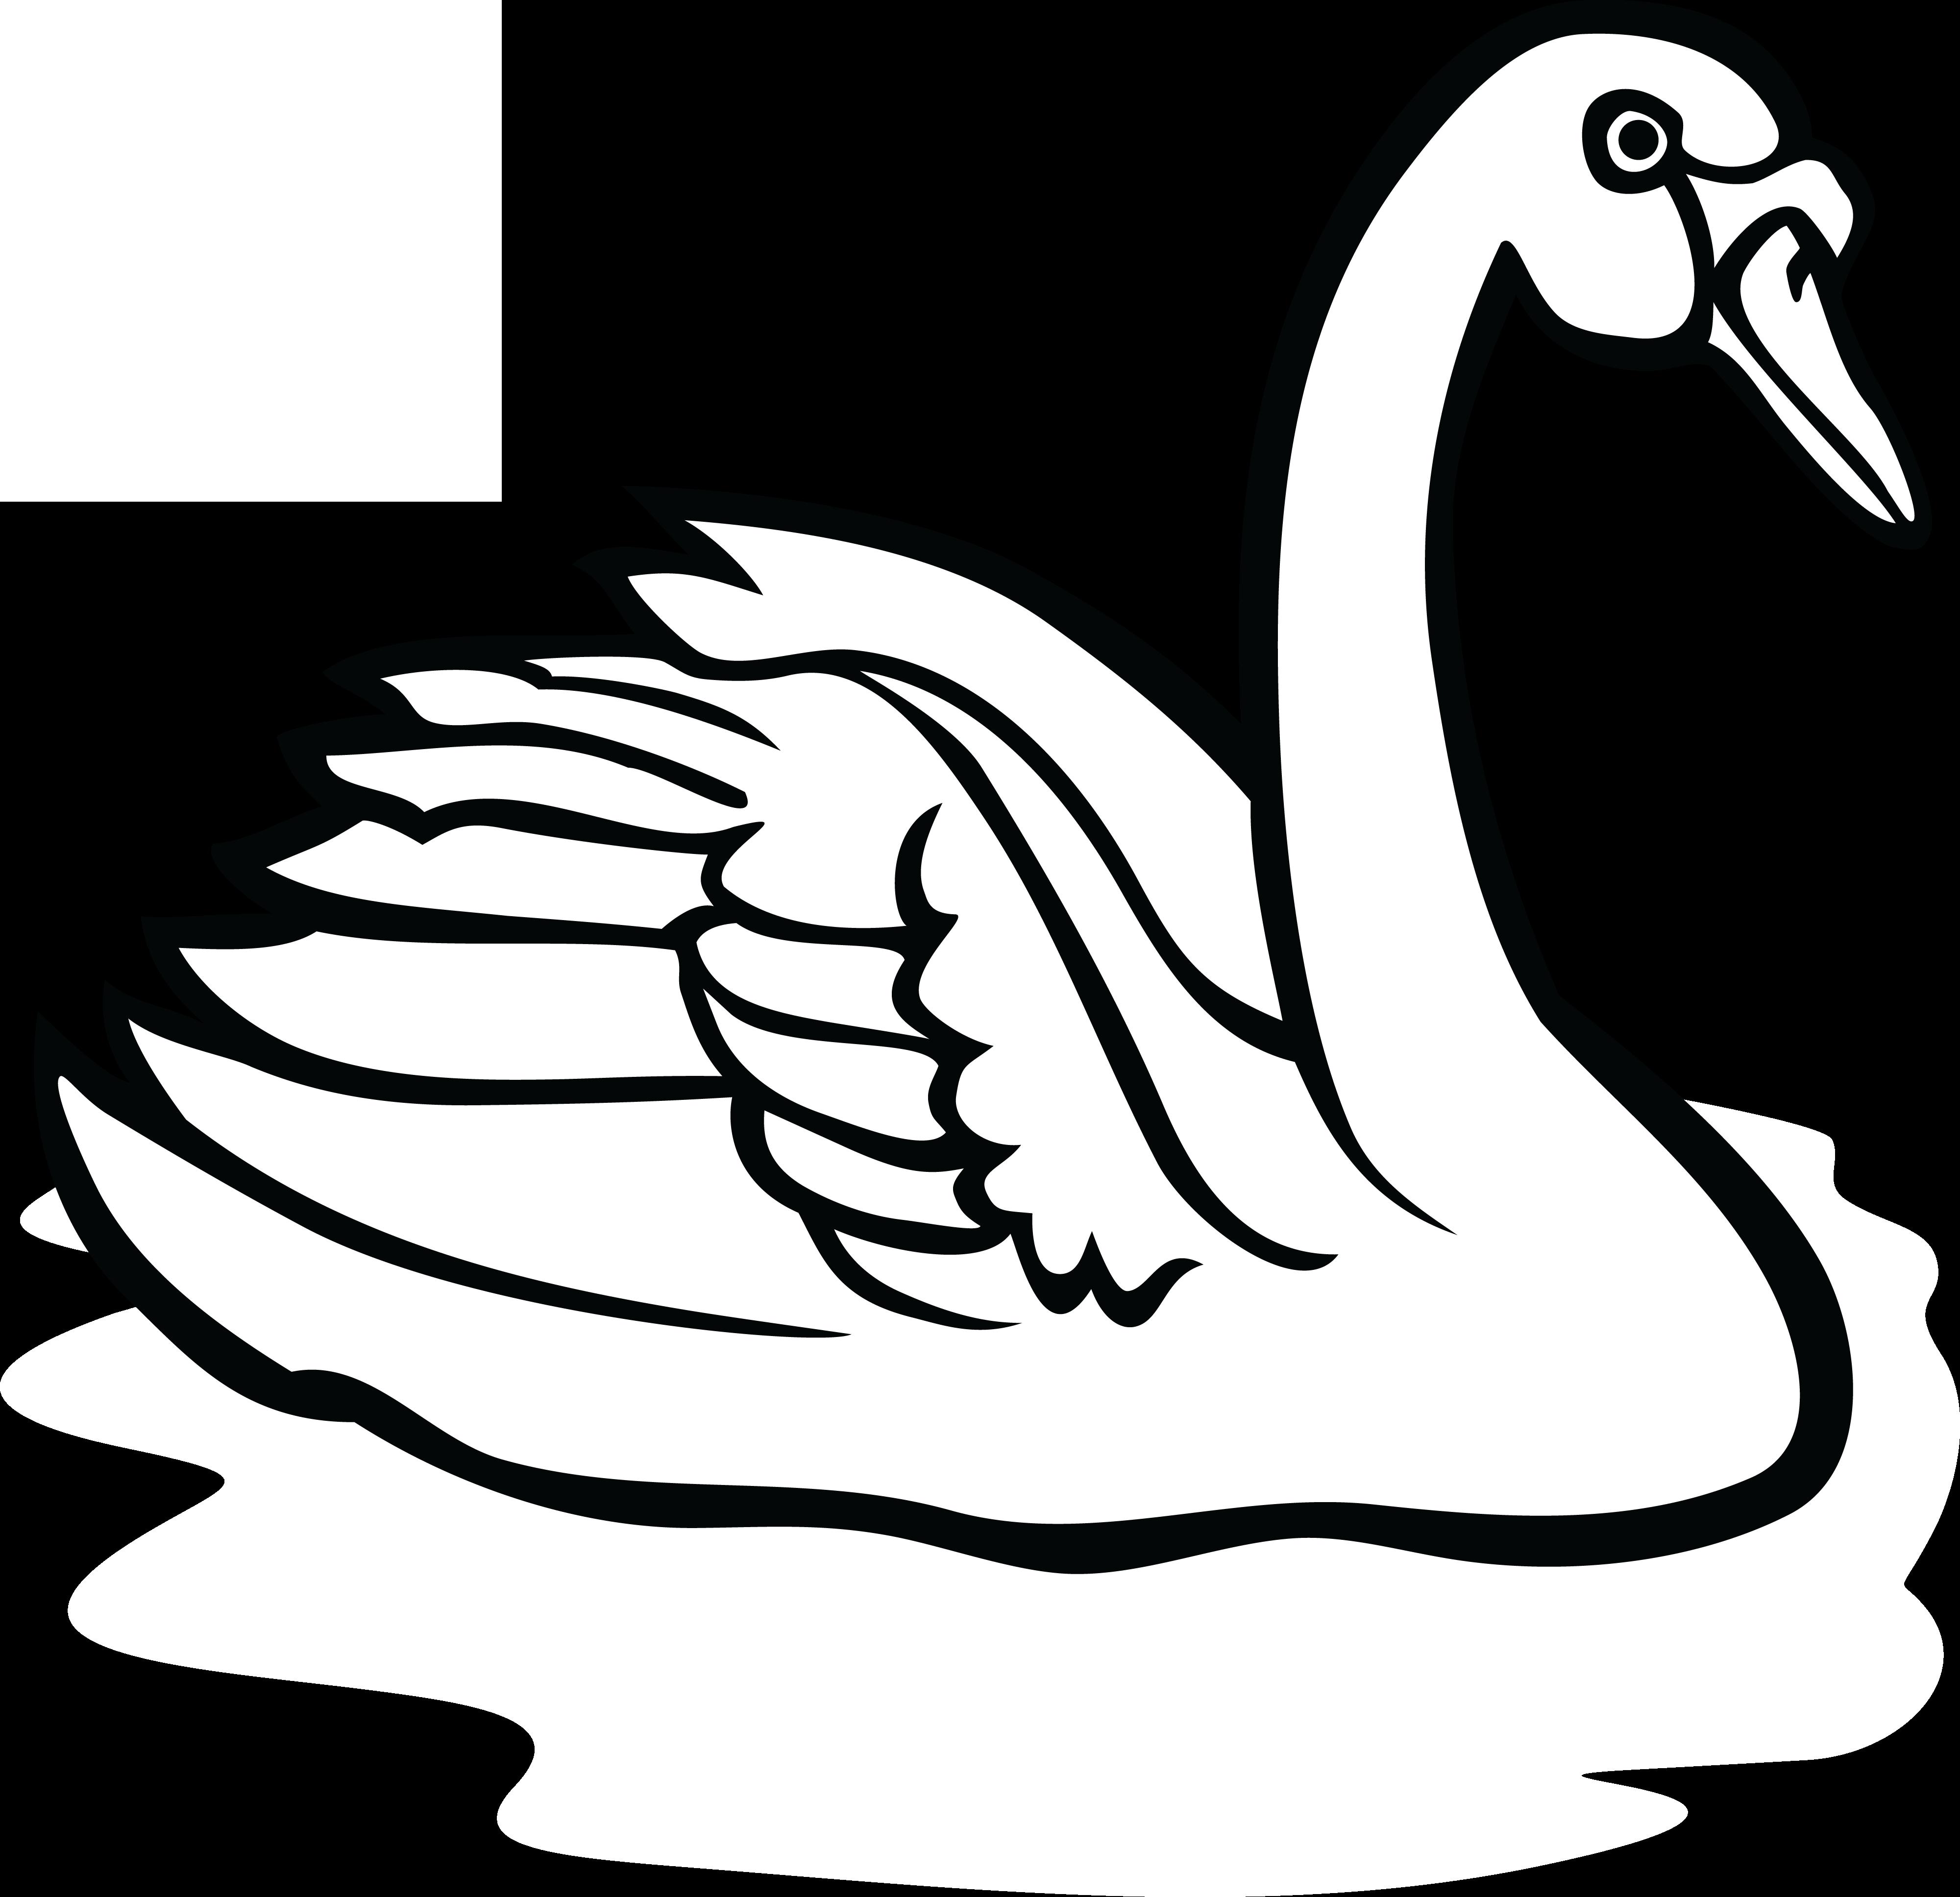 swan line drawing at getdrawings com free for personal use swan rh getdrawings com swan images clip art swan clipart free download